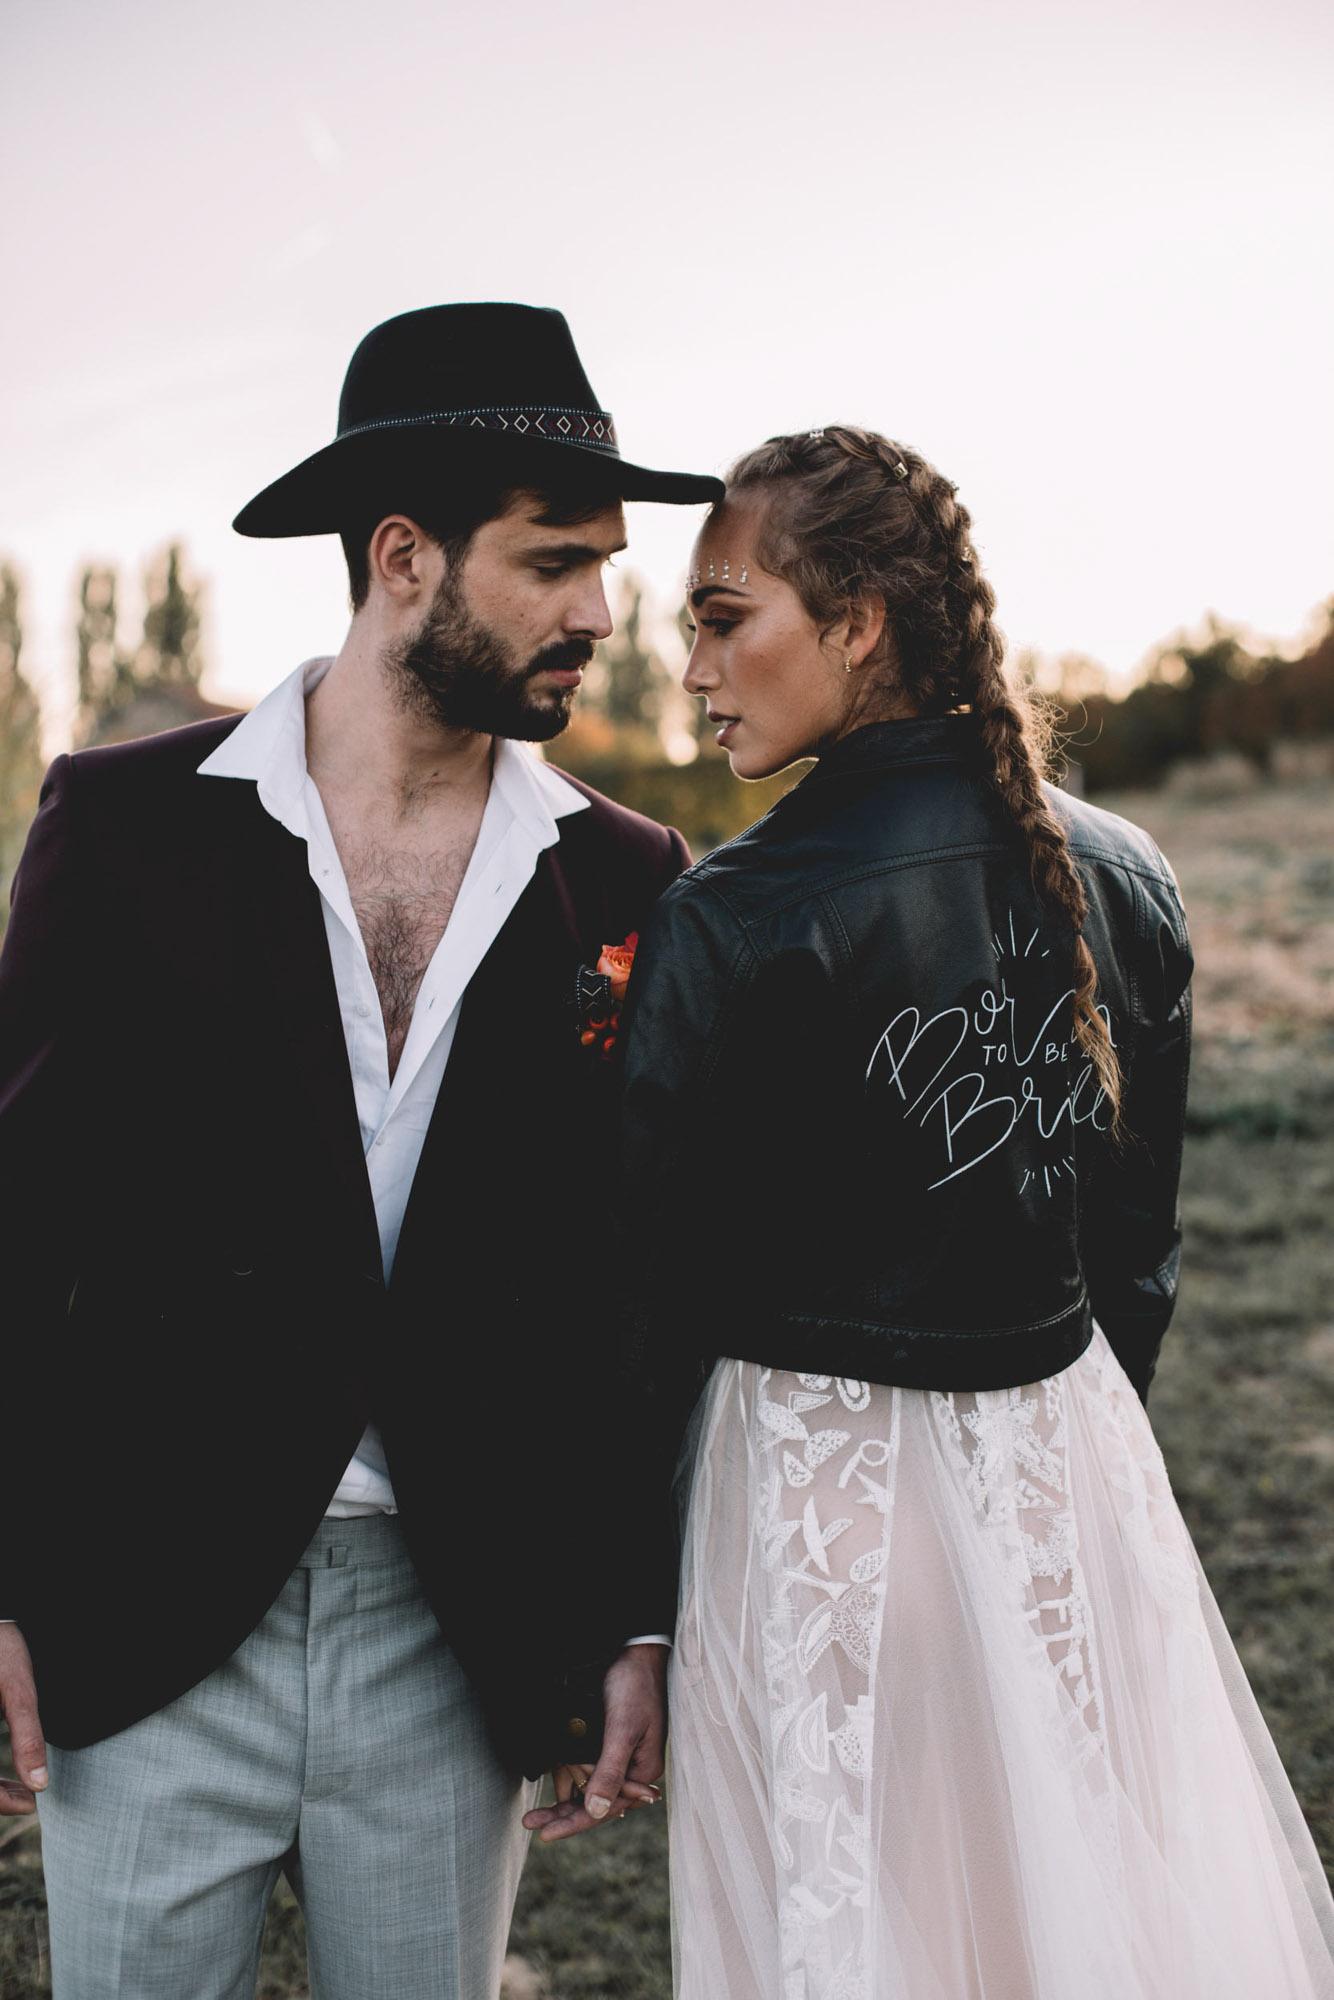 COACHELLA_LES BONNES JOIES_PHOTOGRAPHE_MARIAGE_LES BANDITS-13